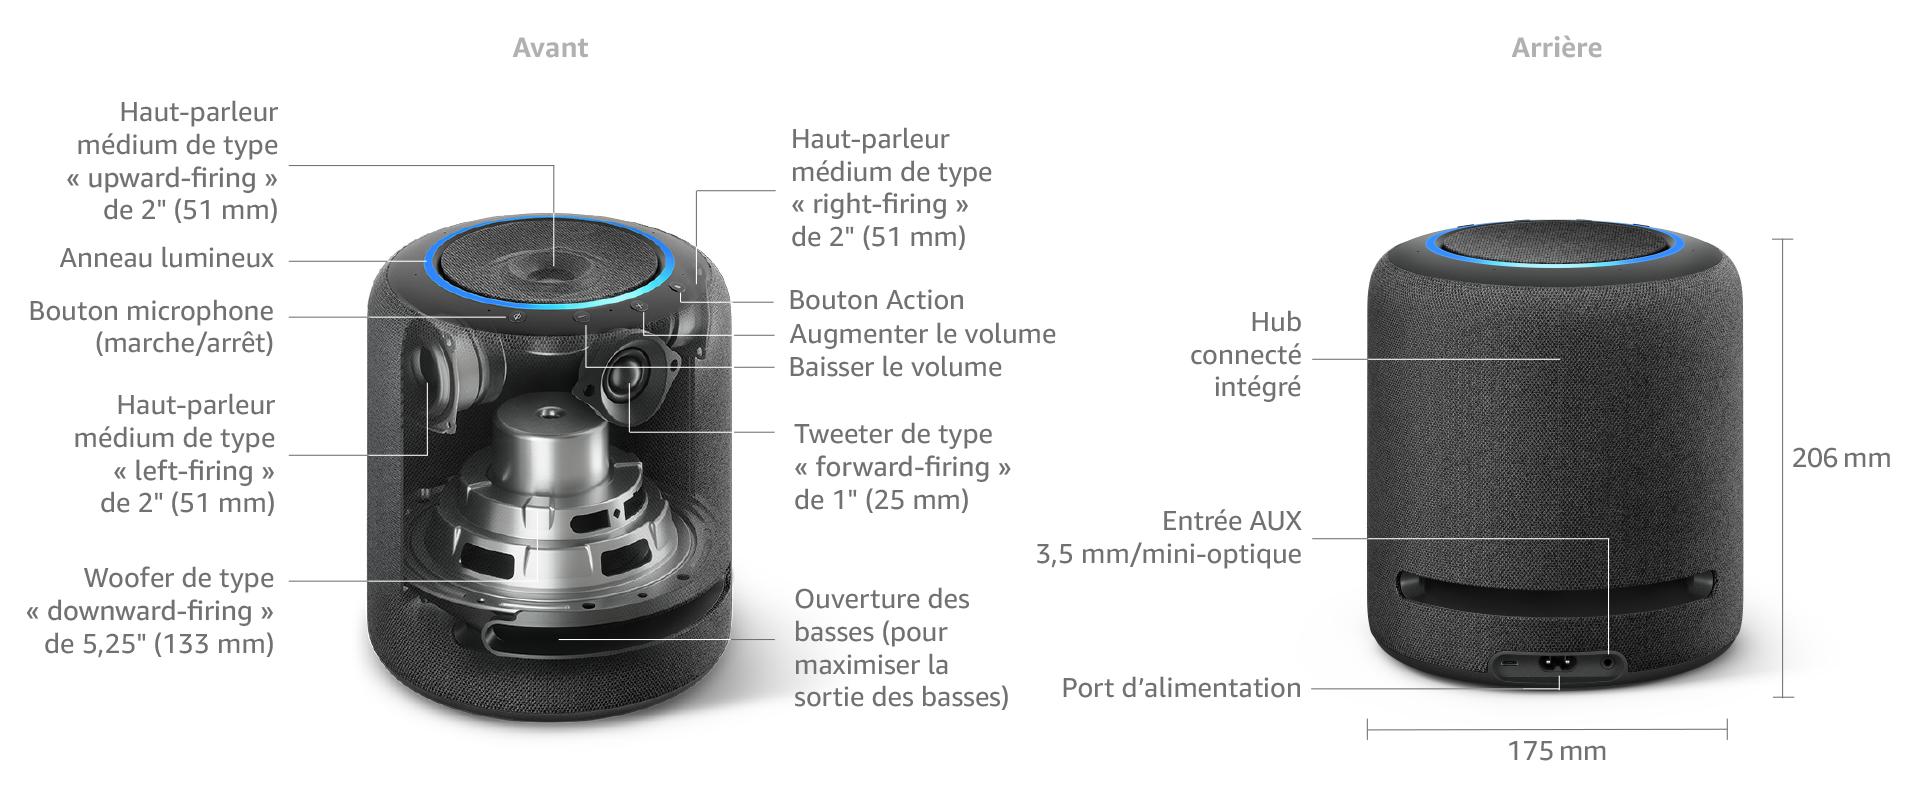 Amazon Echo Studio - Descriptif technique